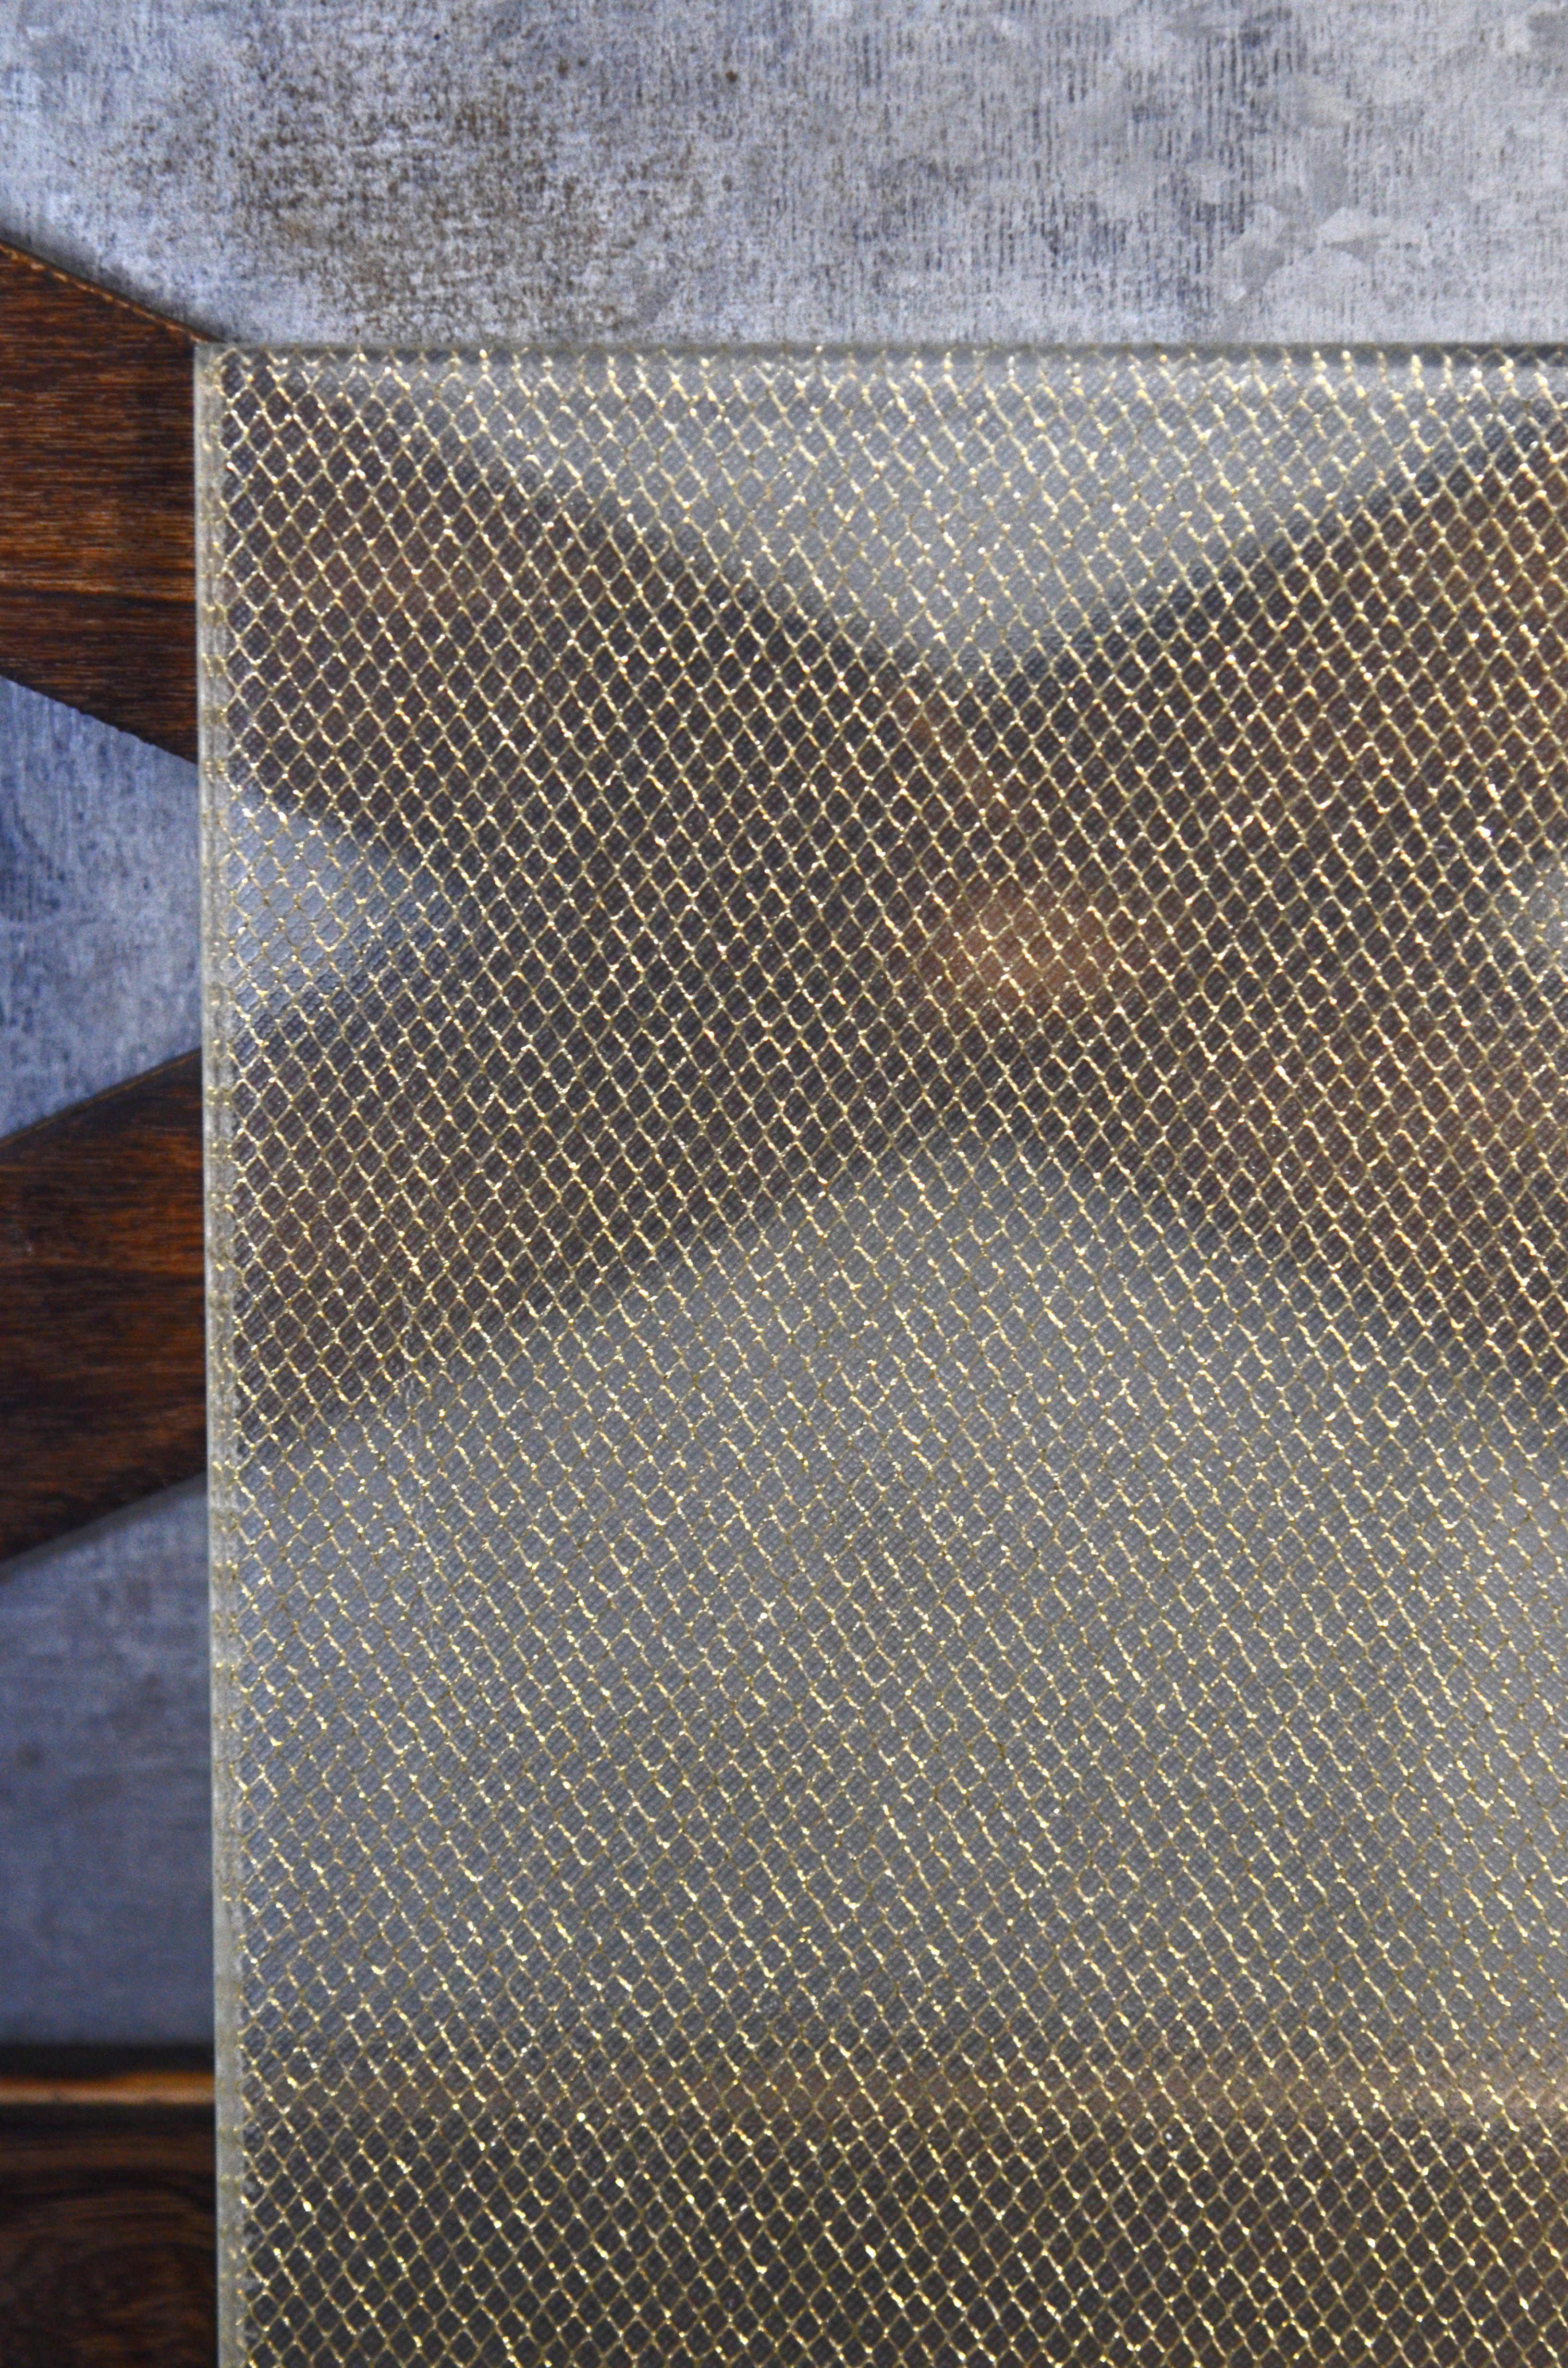 Gold Diamond Sparkle Metallic Mesh Organica Laminated Glass Fabric Laminated Glass Glass Texture Glass Material